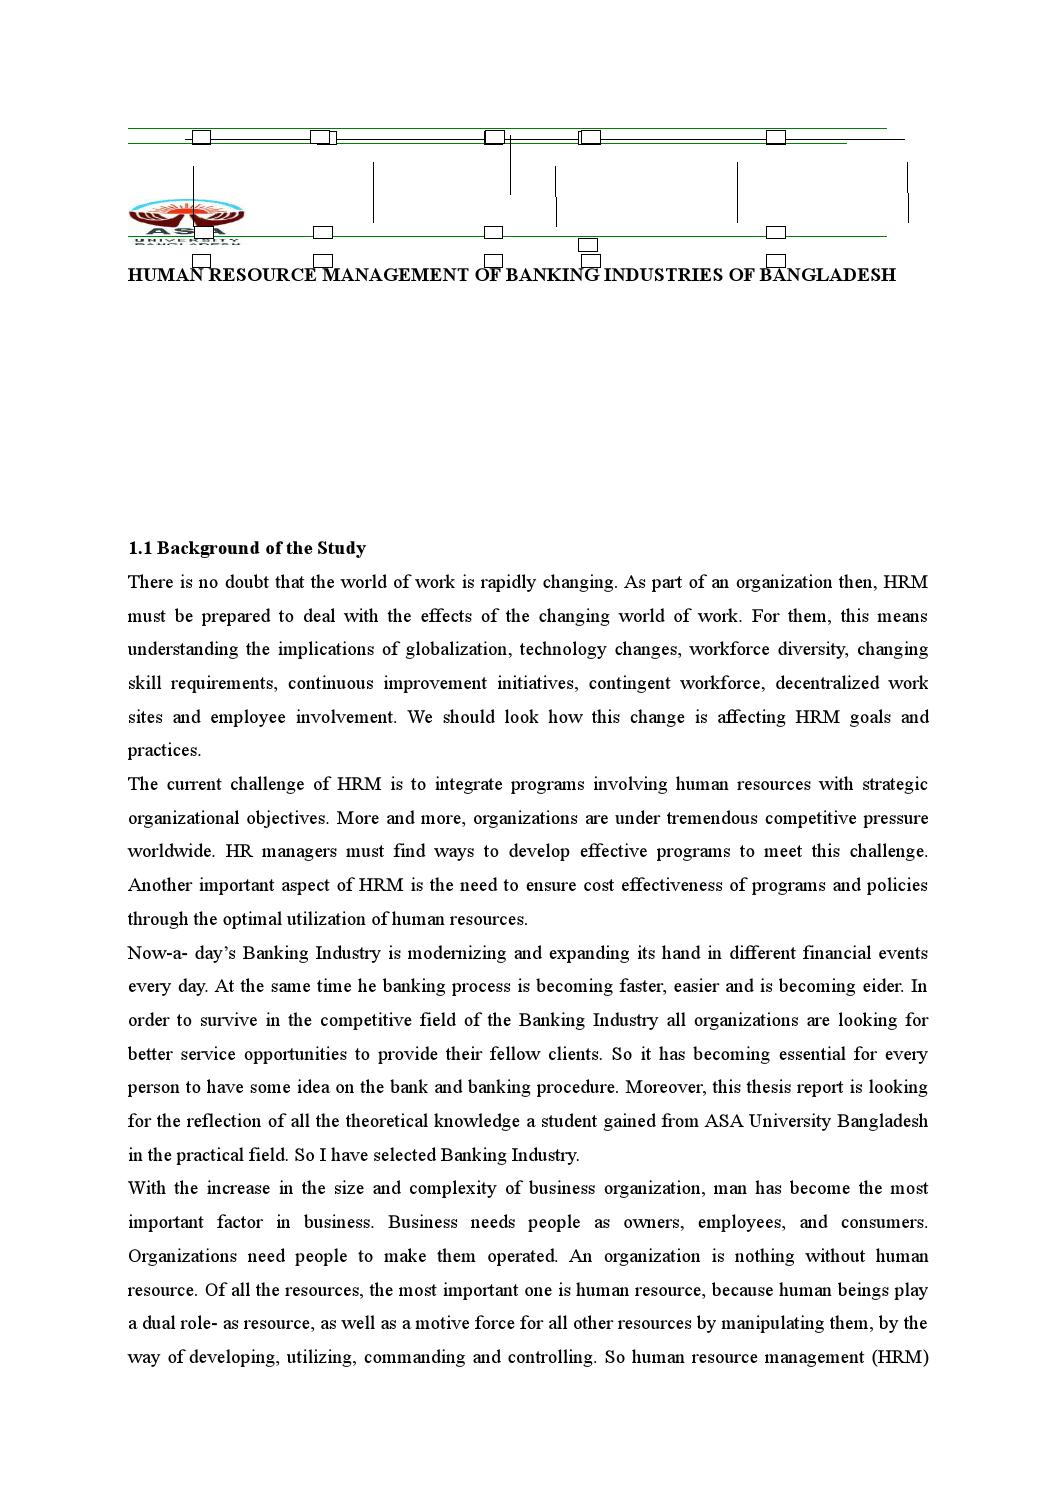 Human Resource Management Practices in Bangladesh: Current Scenario and Future Challenges